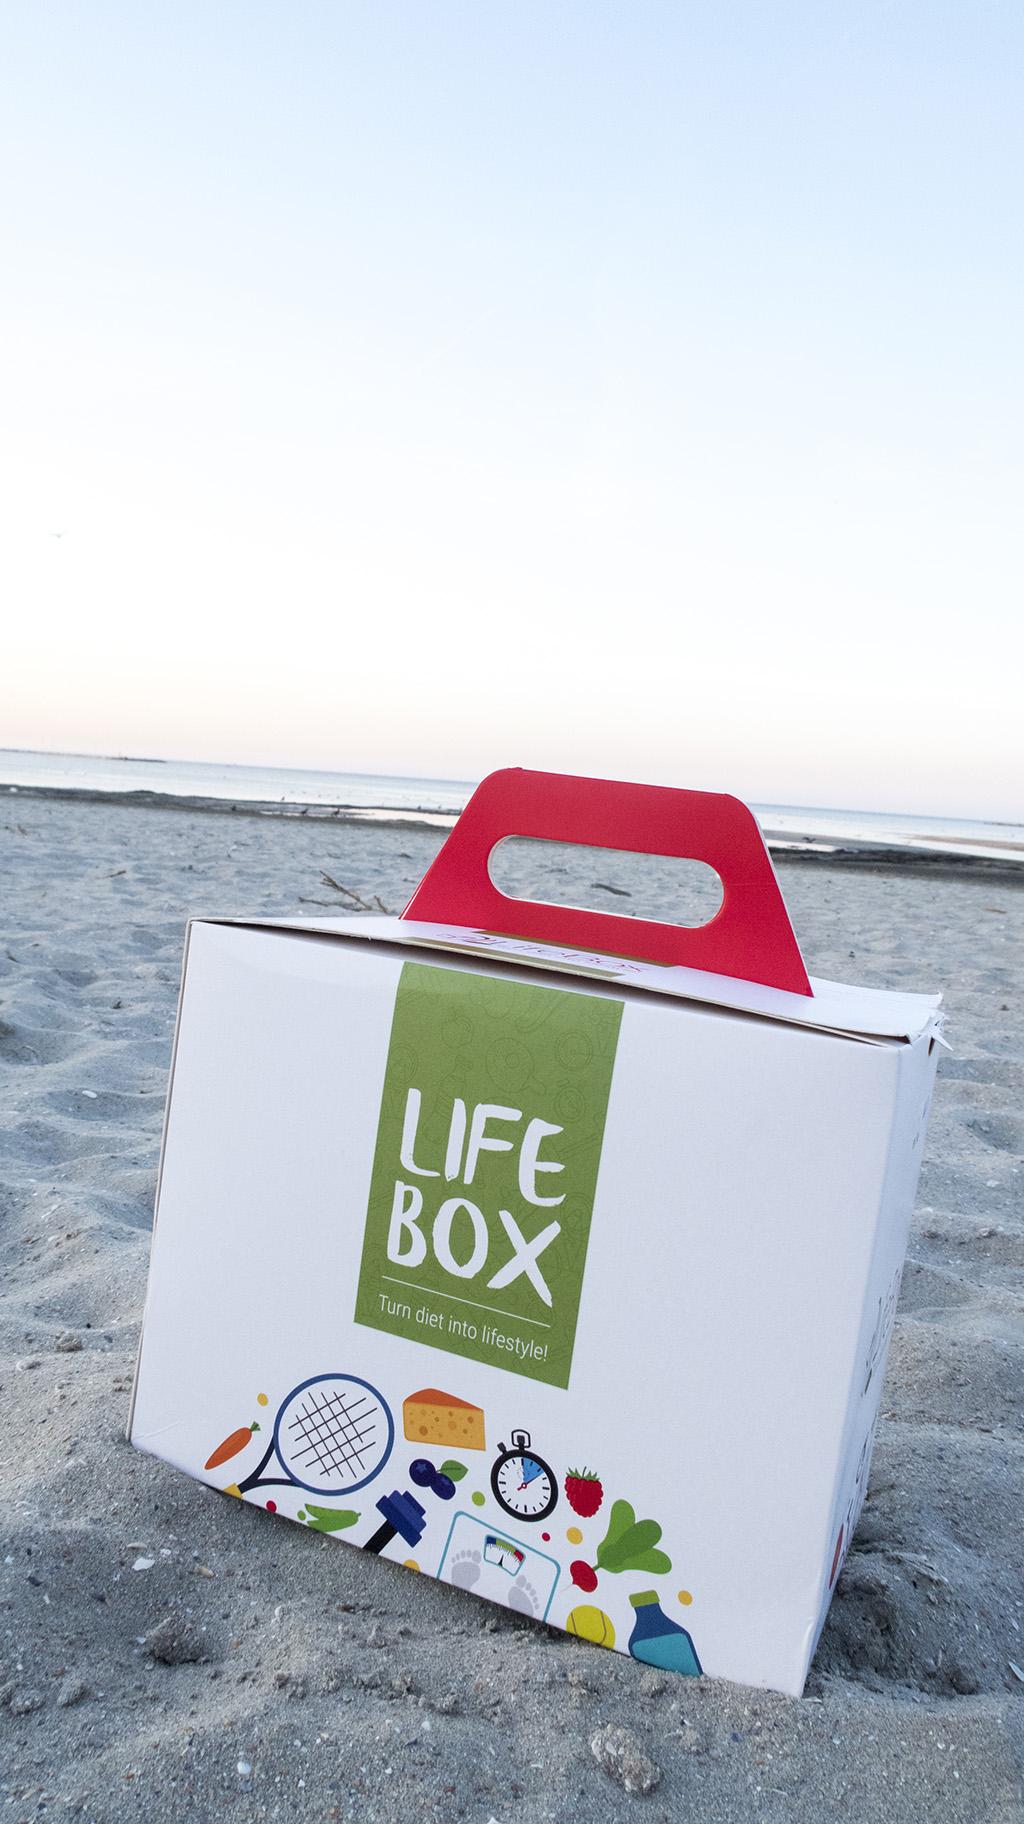 lifebox constanta stil de viata sanatos